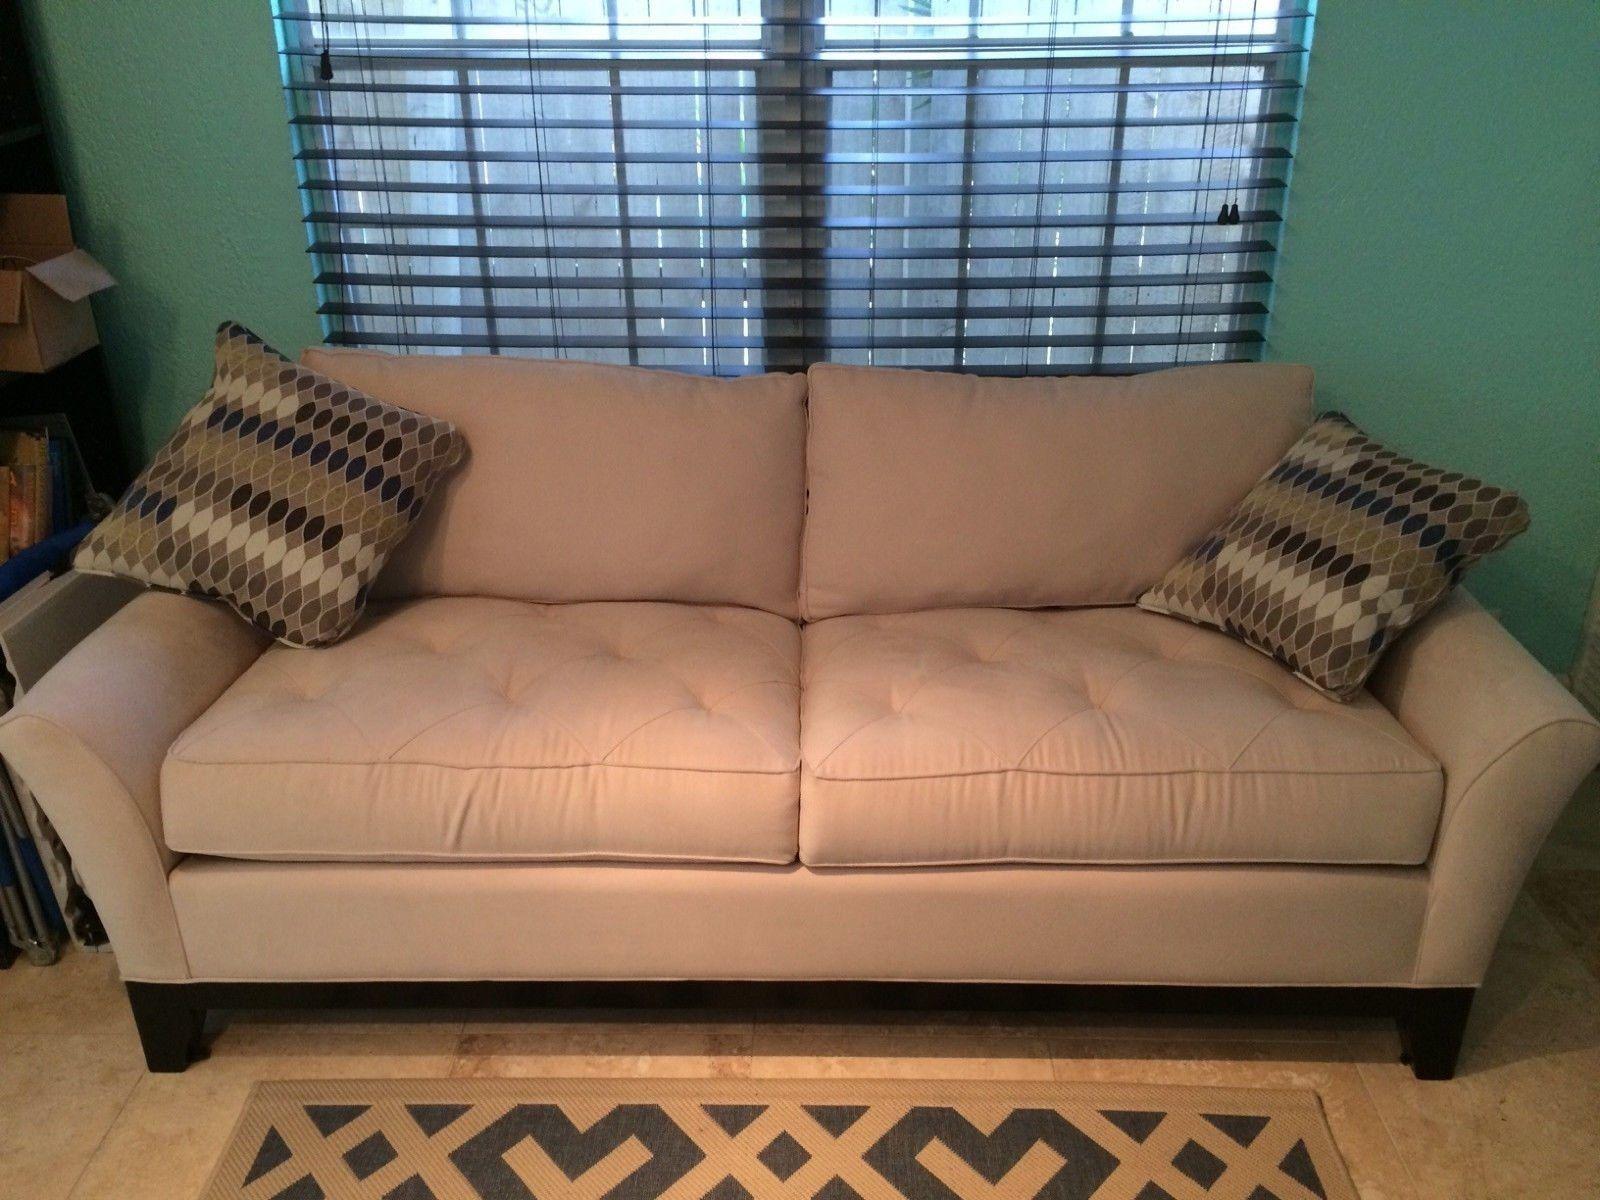 High Quality Sleeper Sofa 5 Sources For High Quality Sleeper Sofas